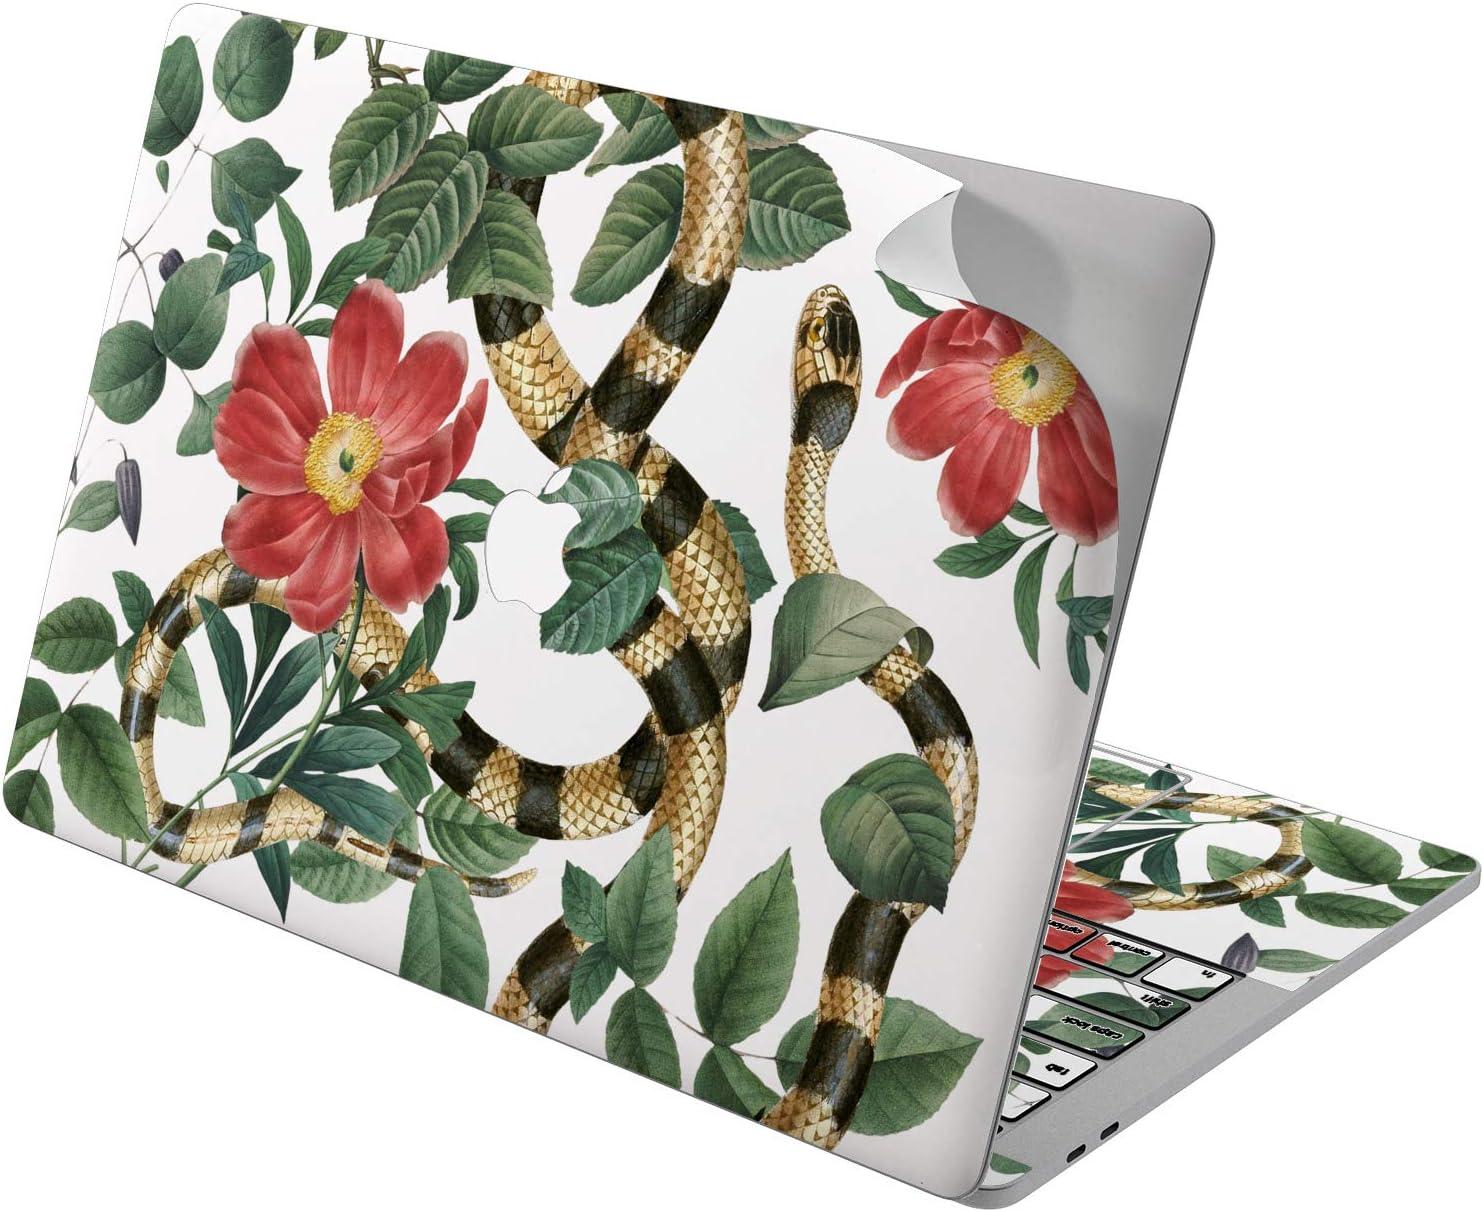 "Cavka Vinyl Decal Skin for Apple MacBook Pro 13"" 2019 15"" 2018 Air 13"" 2020 Retina 2015 Mac 11"" Mac 12"" Cute Serpent Protective Jungle Snake Cover Art Sticker Laptop Green Golden Flowers Print Design"